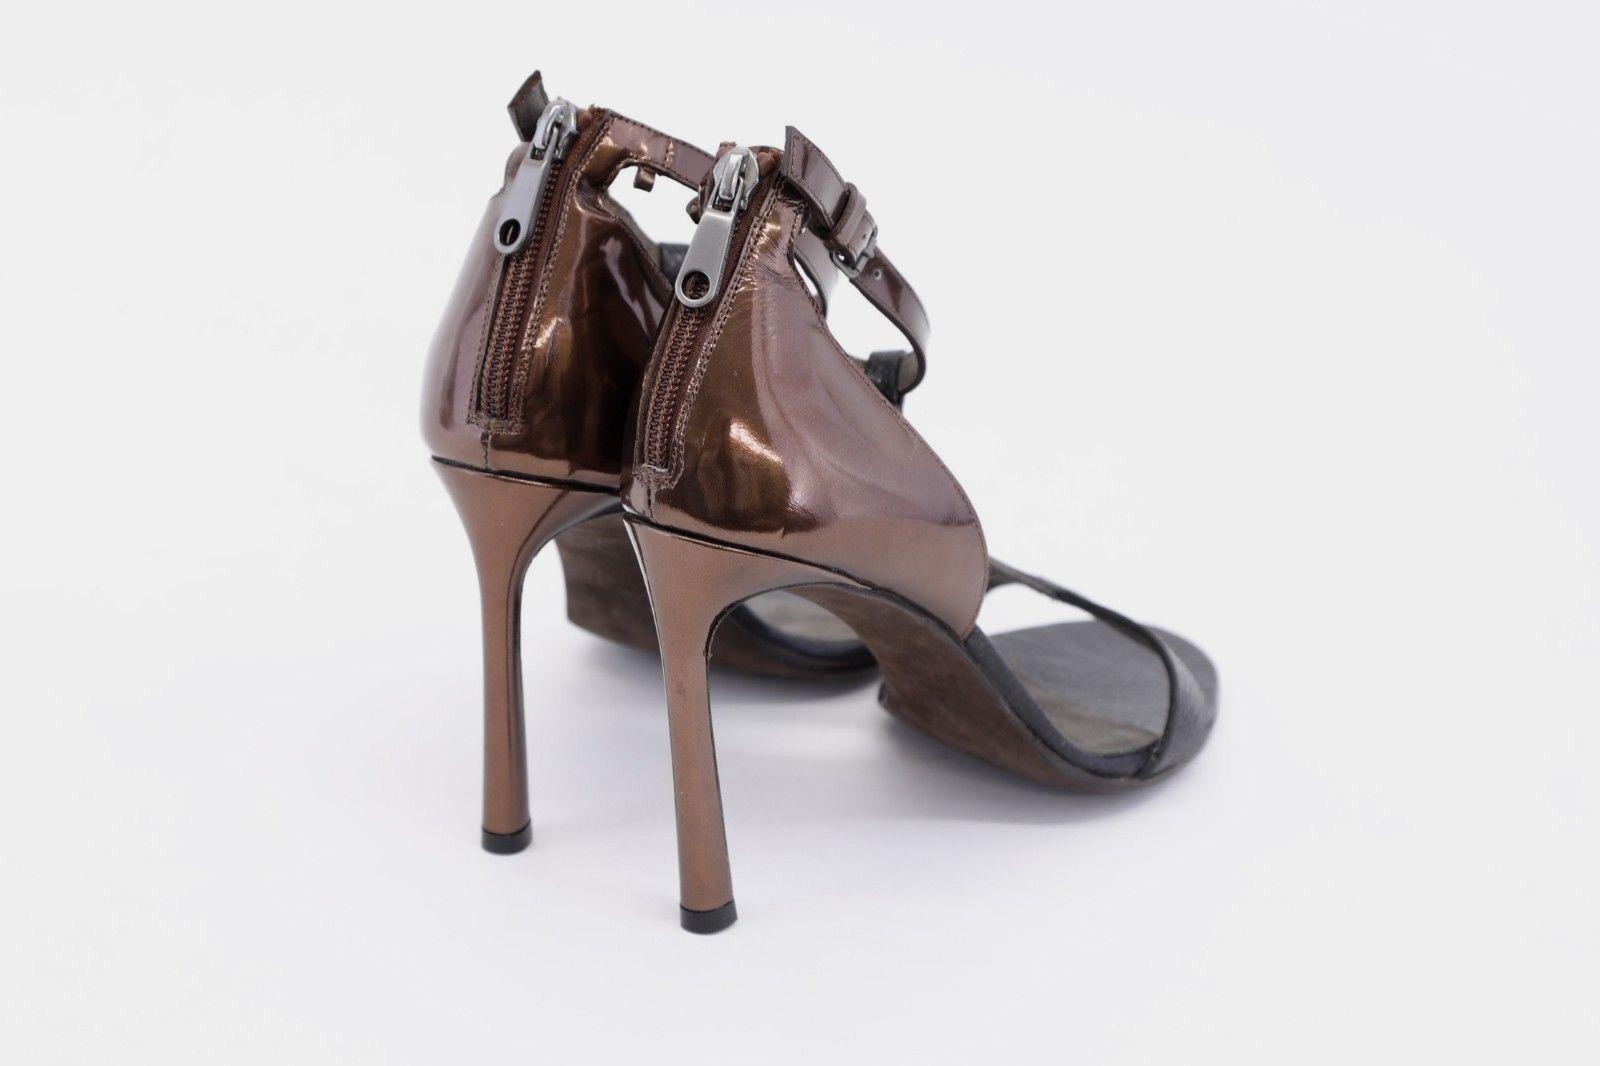 NWOB 2095 Brunello Cucinelli 2Tone Multi-Leather Beaded T-Strap Heel 37 37 37 7US A186 9bdb26